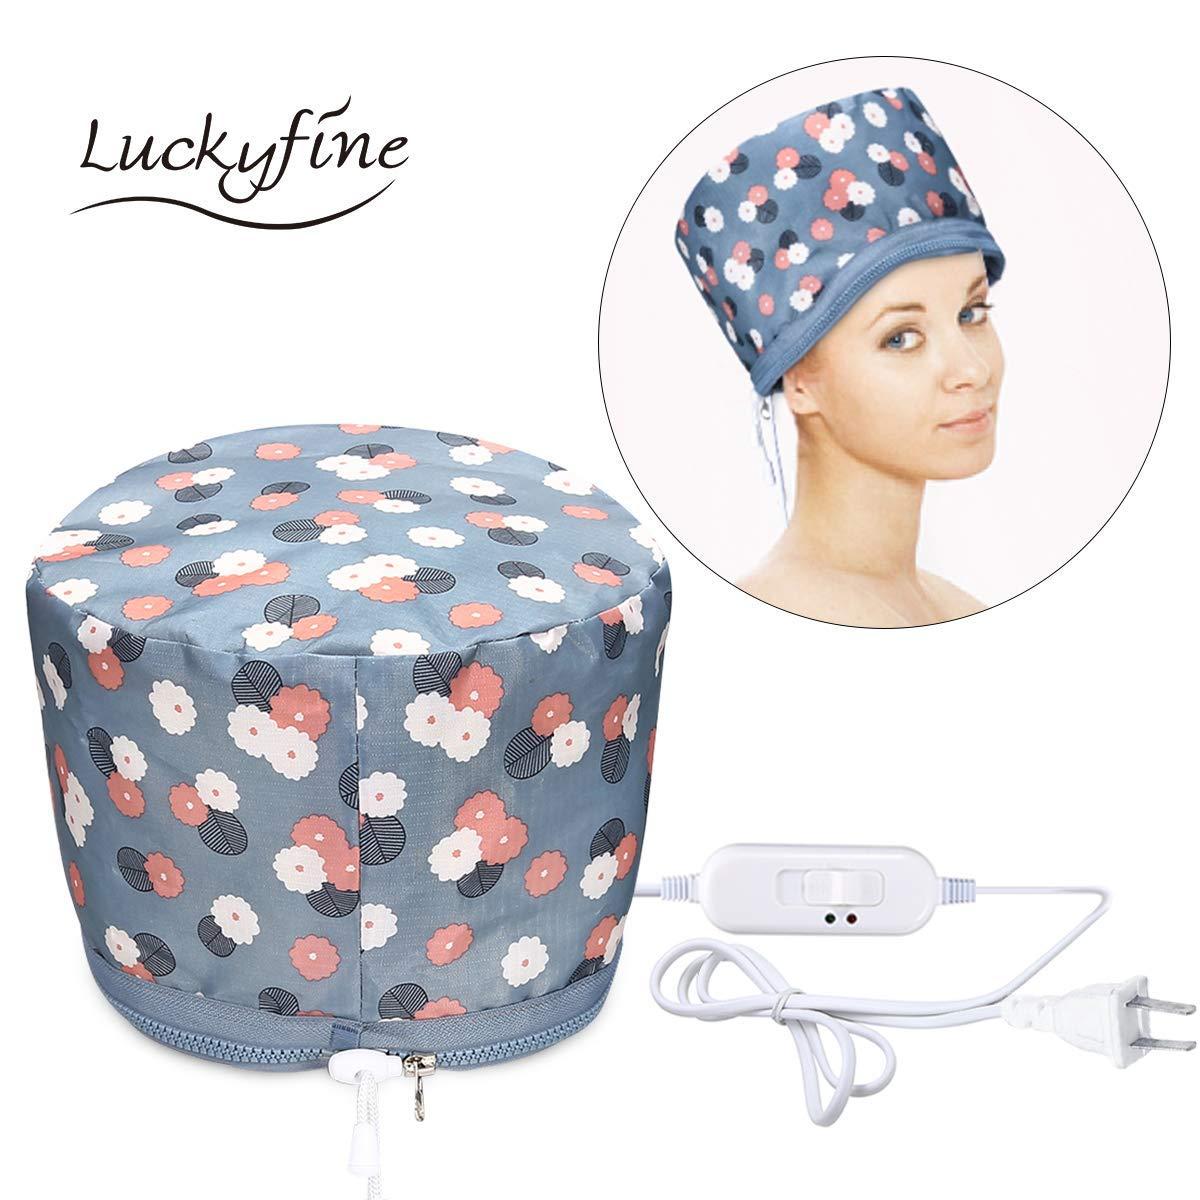 LUCKYFINE 110v Hair Thermal Steamer Treatment SPA Cap Nourishing Care Hat New Beauty Steamer Nourishing Hat 23 x 17cm